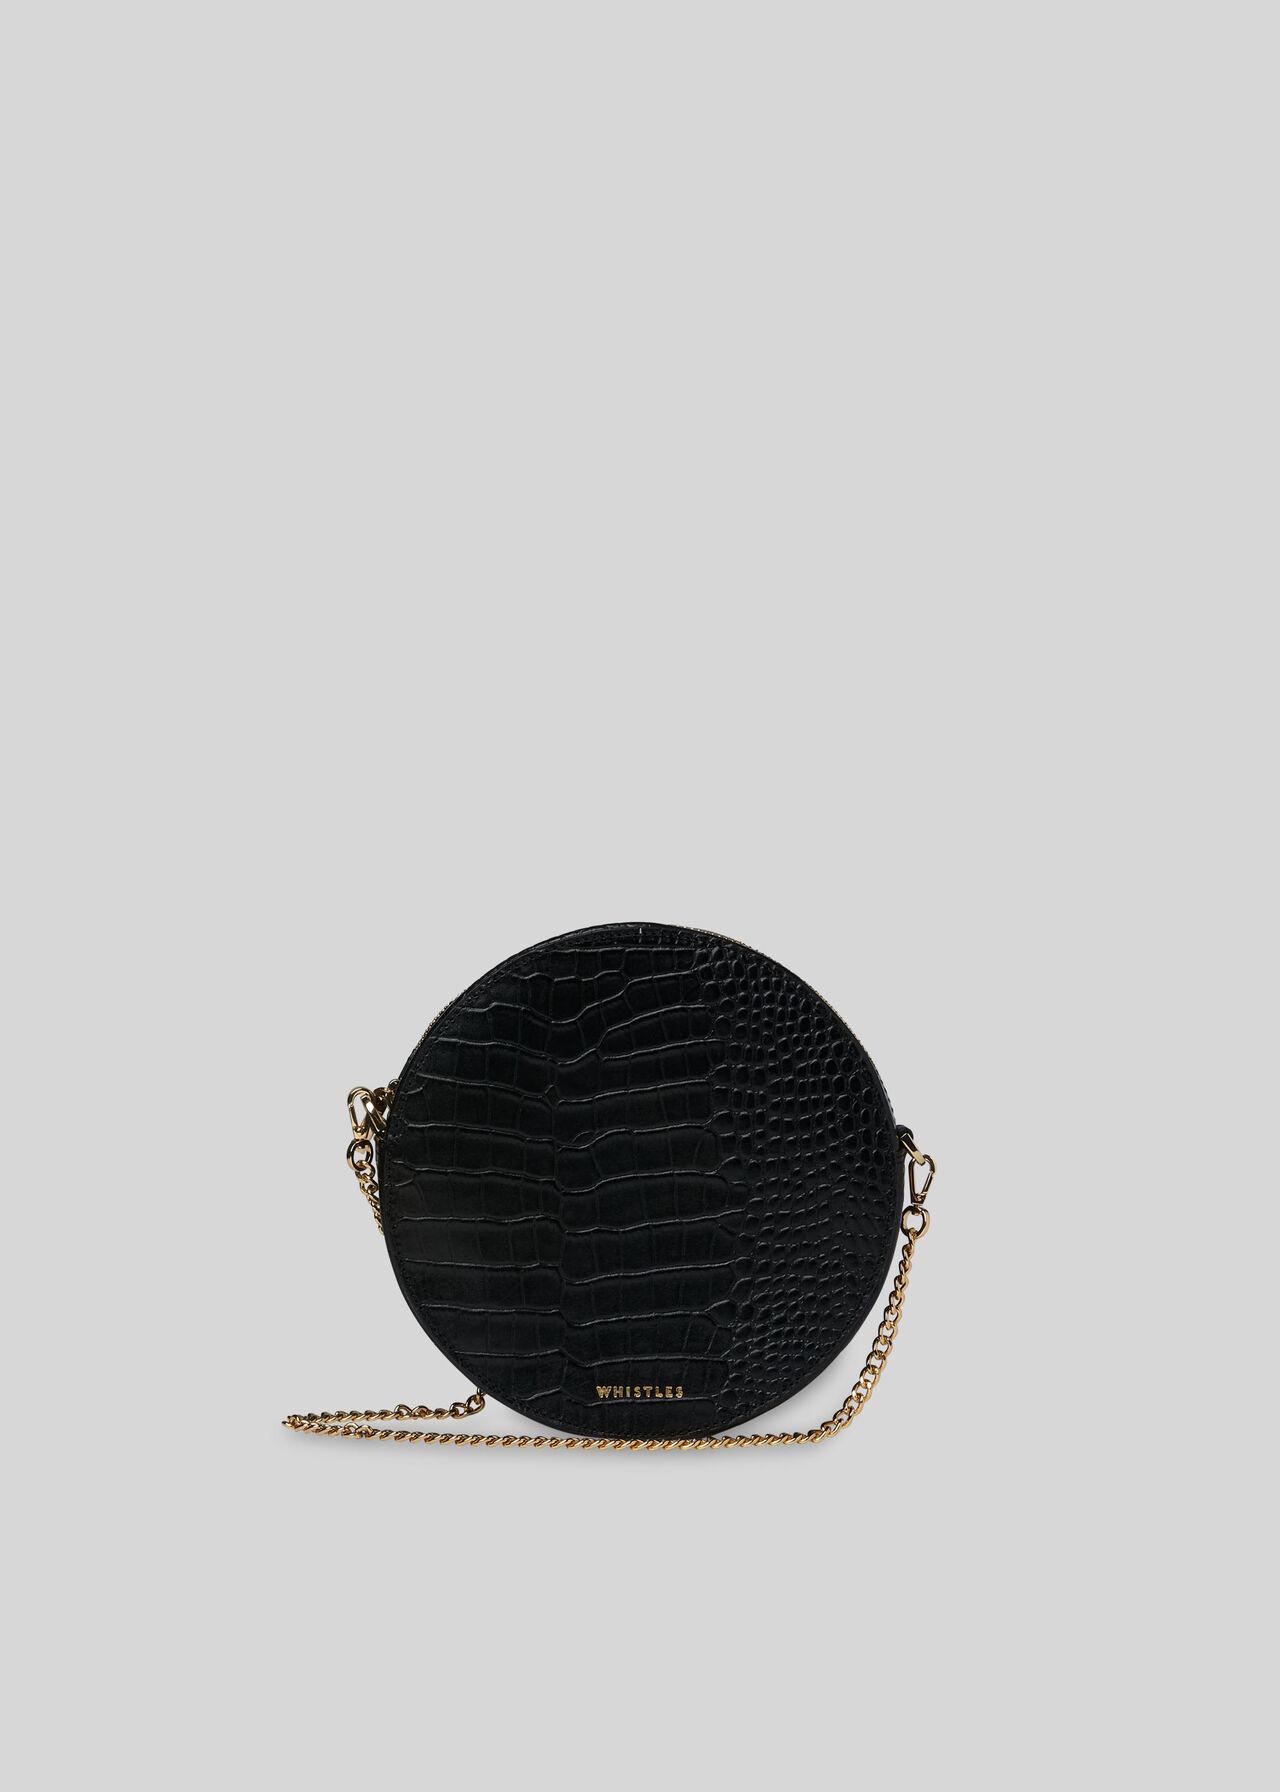 Brixton Circular Croc Bag Black Whistles